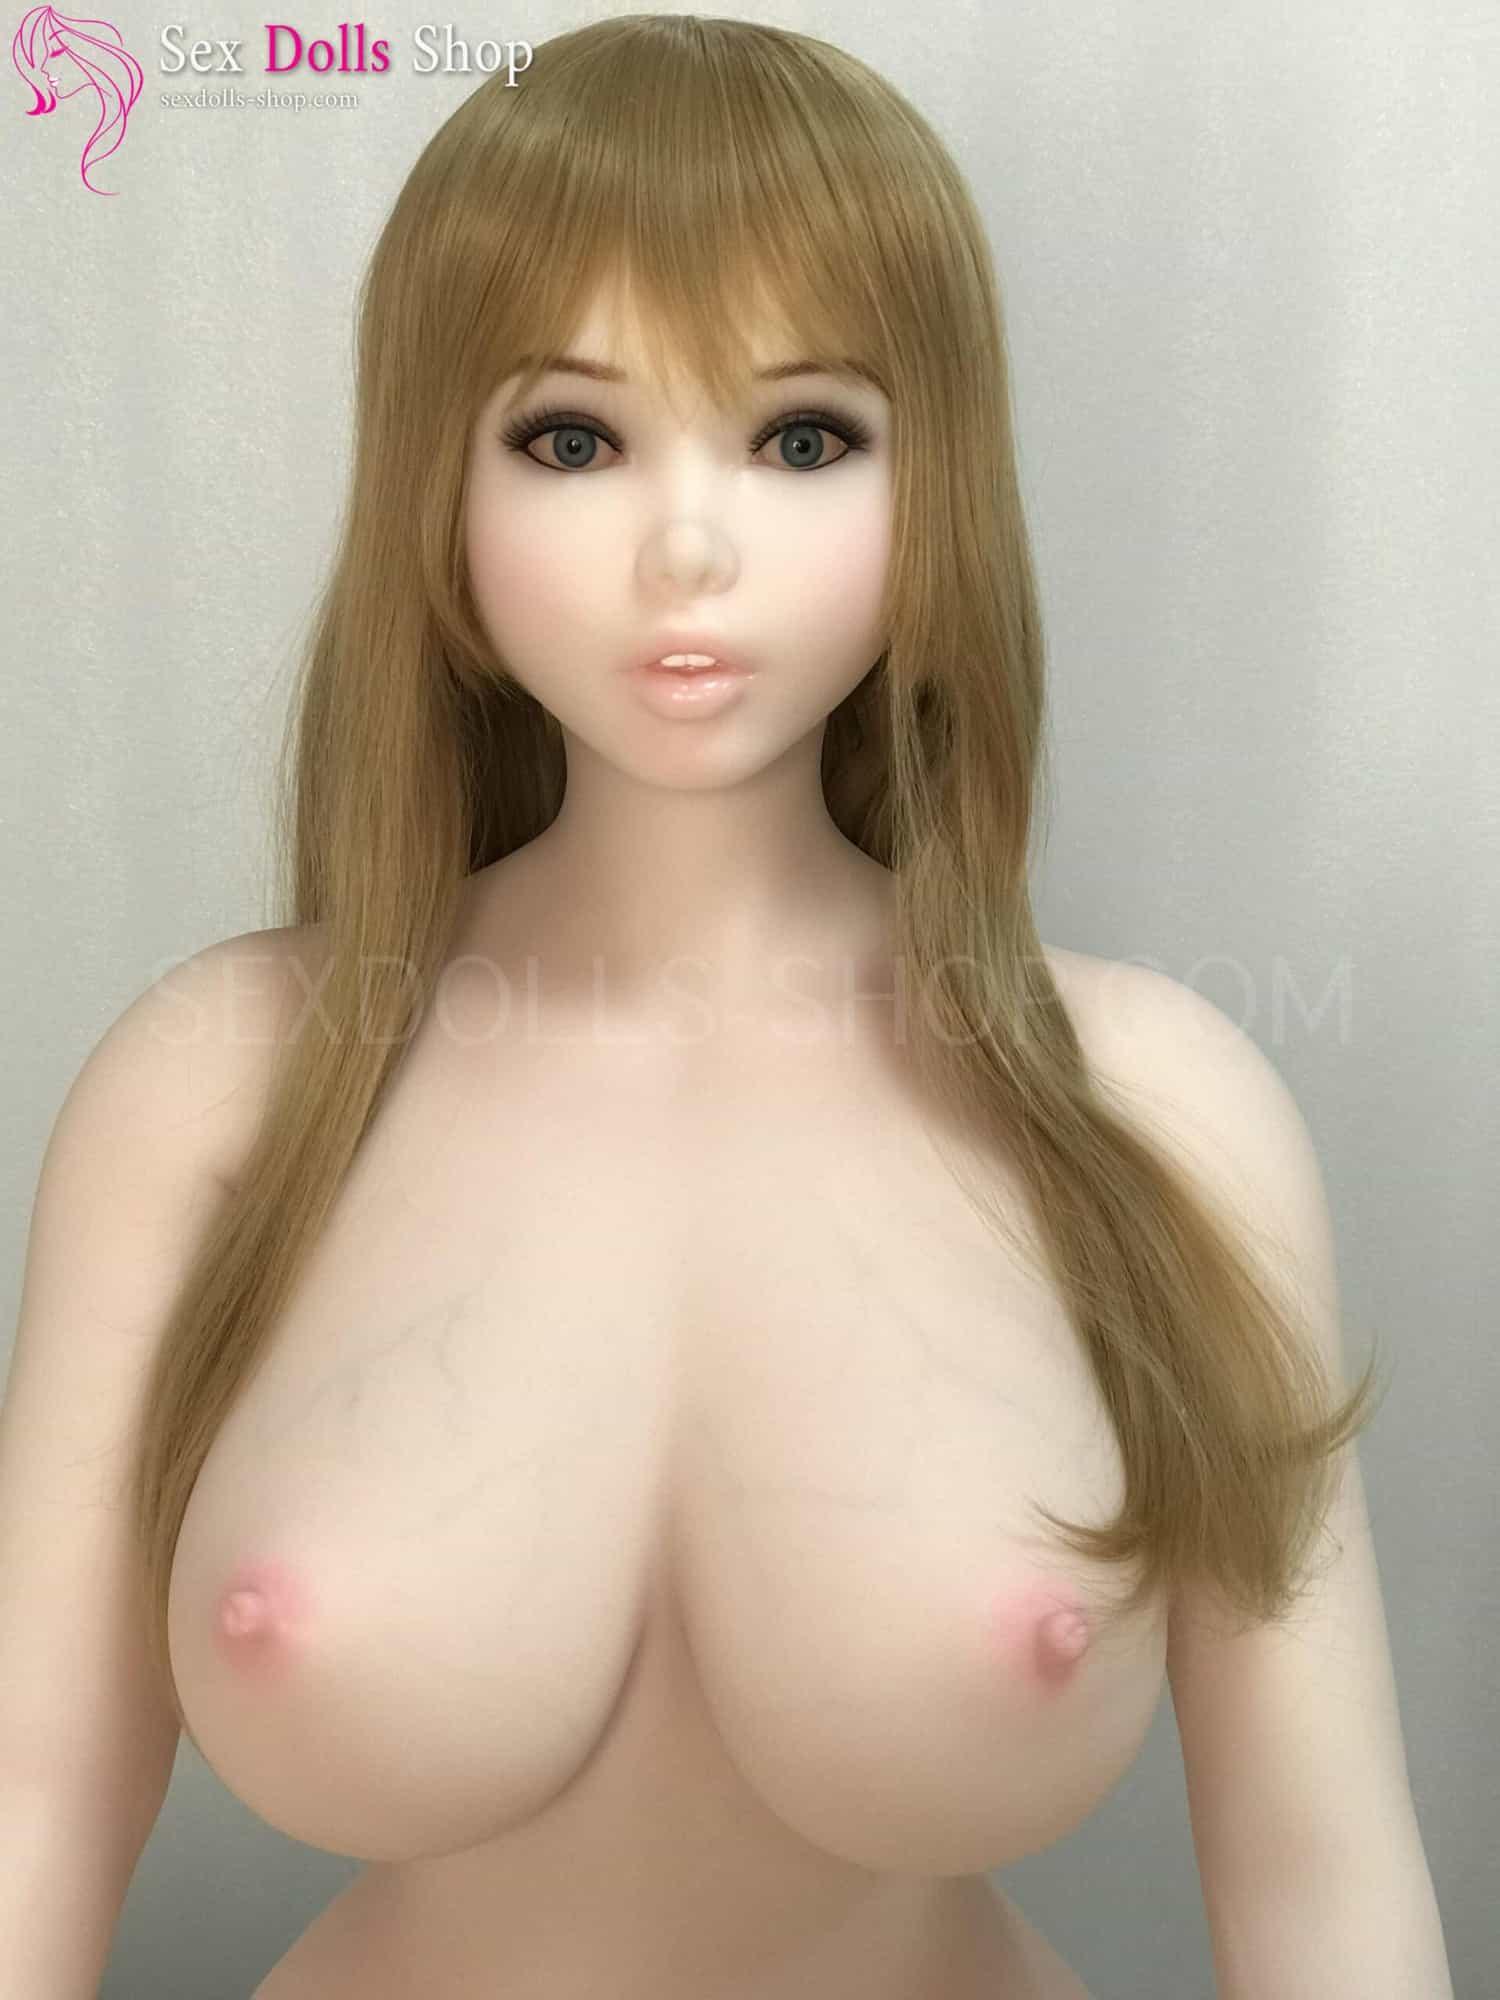 piperdoll 150cm J cup white skin pink nipples